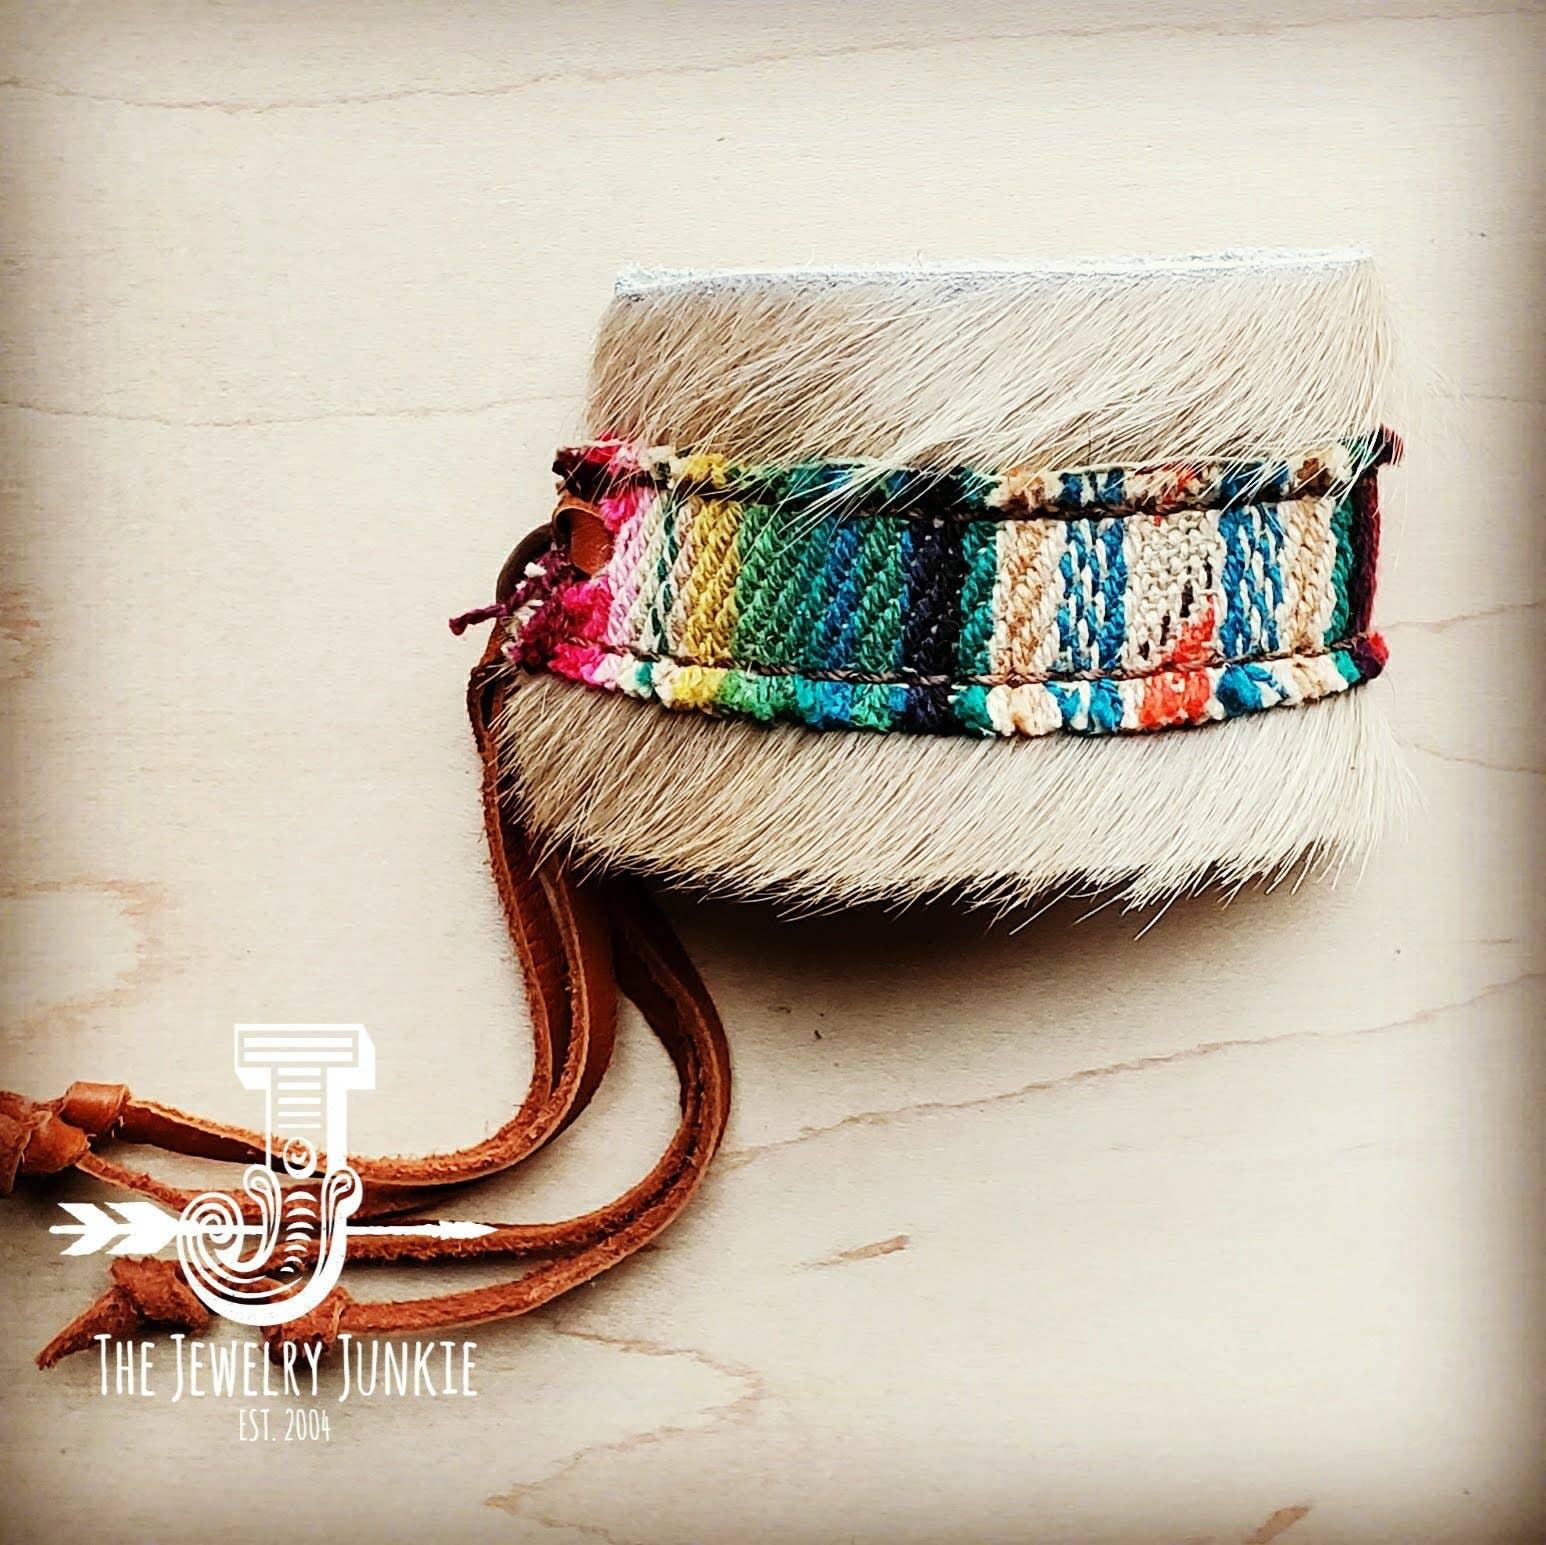 Spirit Body Triangle Bracelet Leather Knit Rope Handmade Style Mind